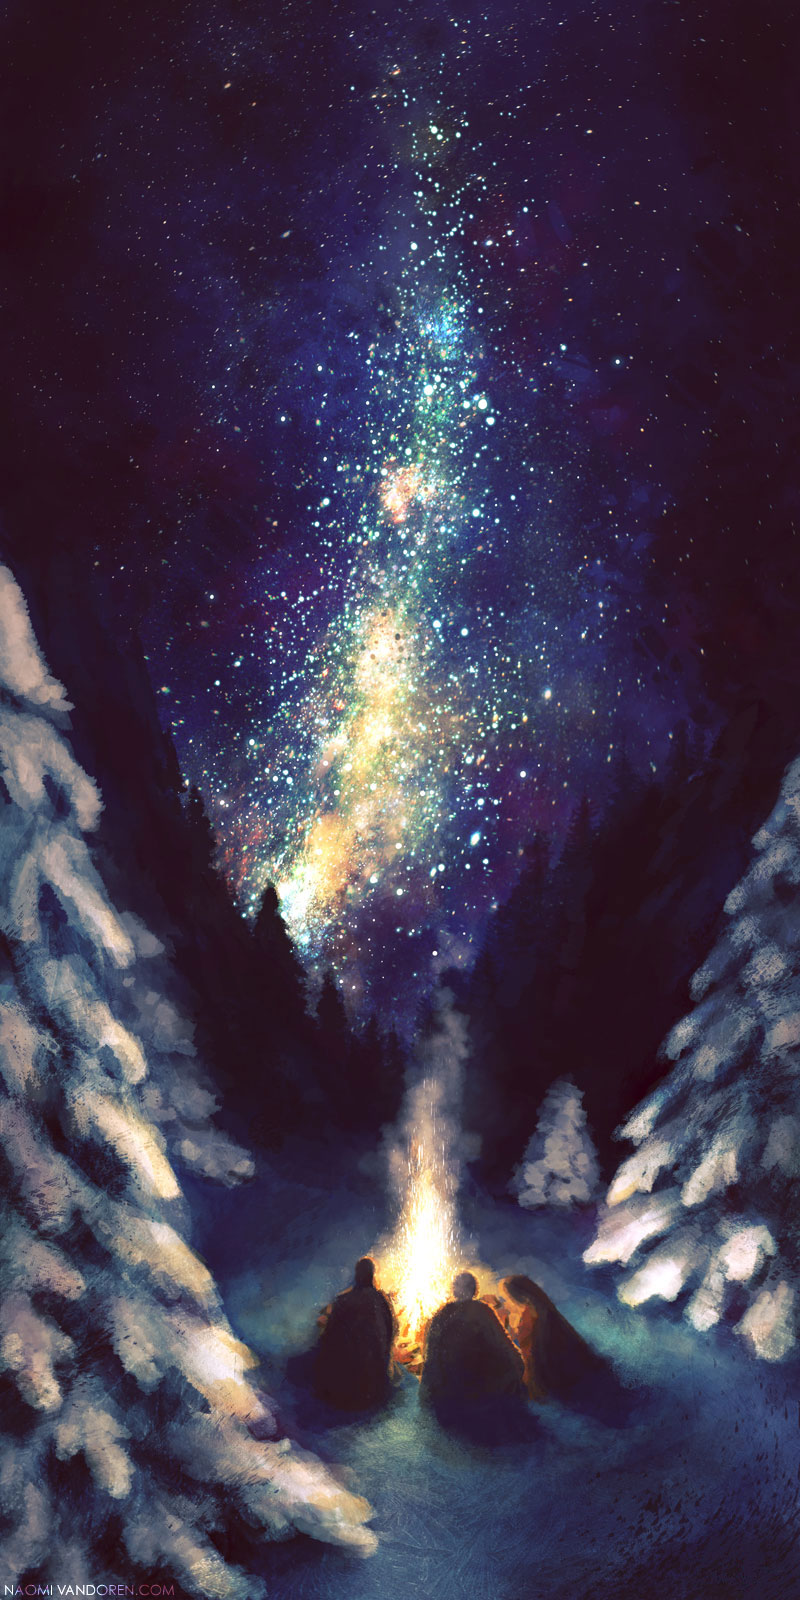 Stars-in-the-night-Sky-Naomi-VanDoren800w